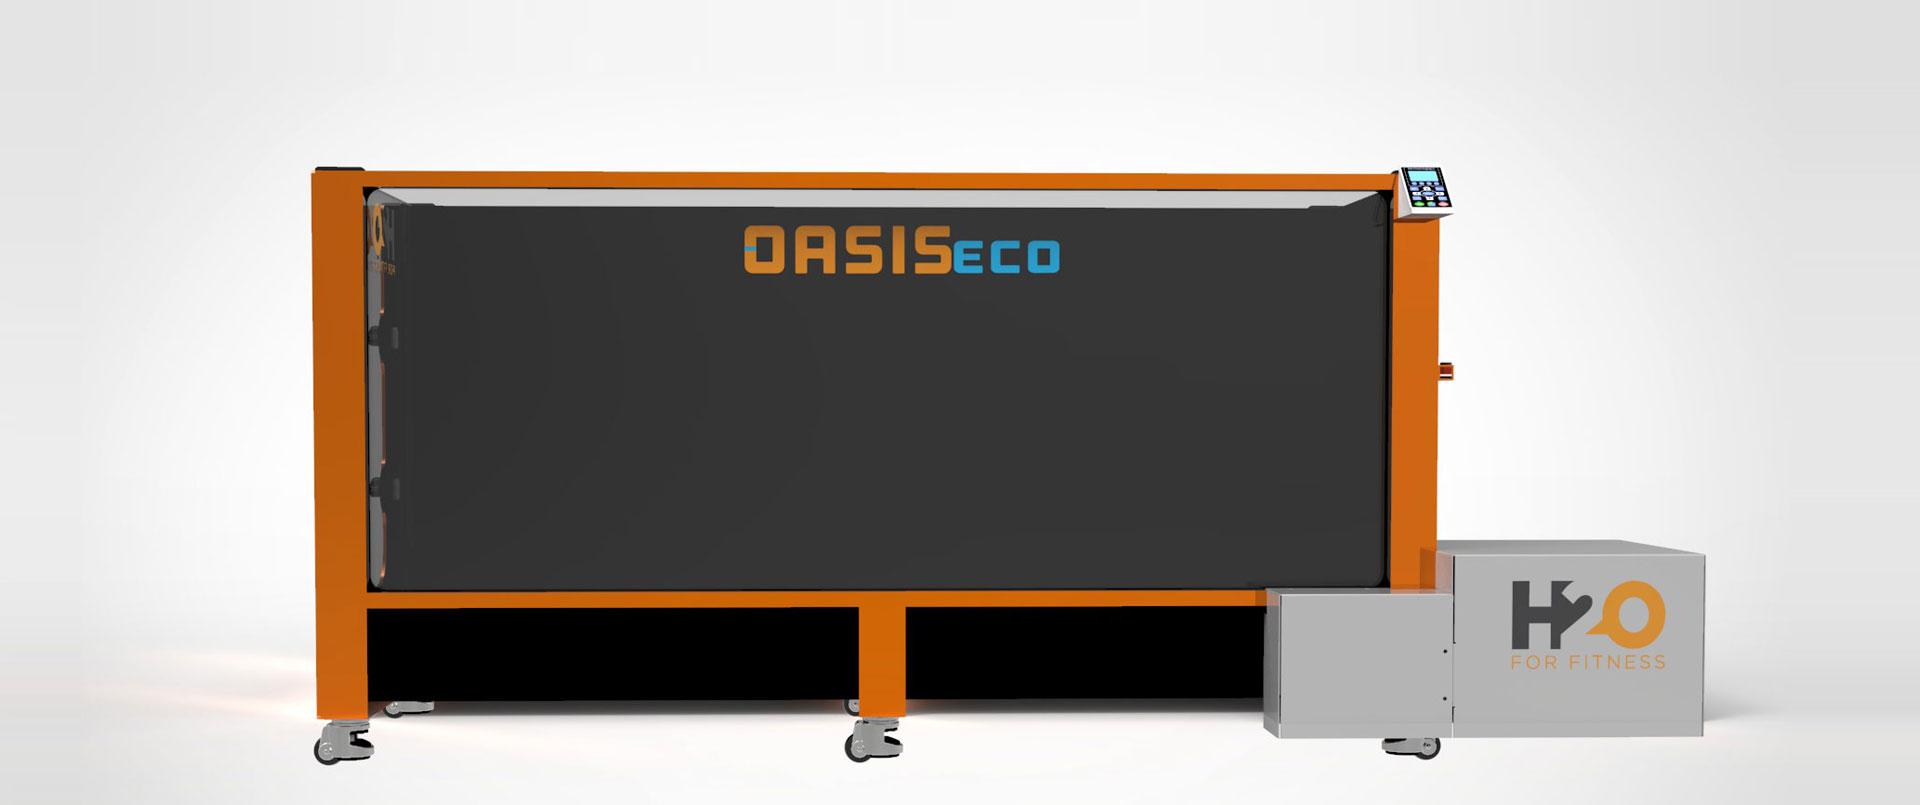 Oasis-Eco-226-Banner